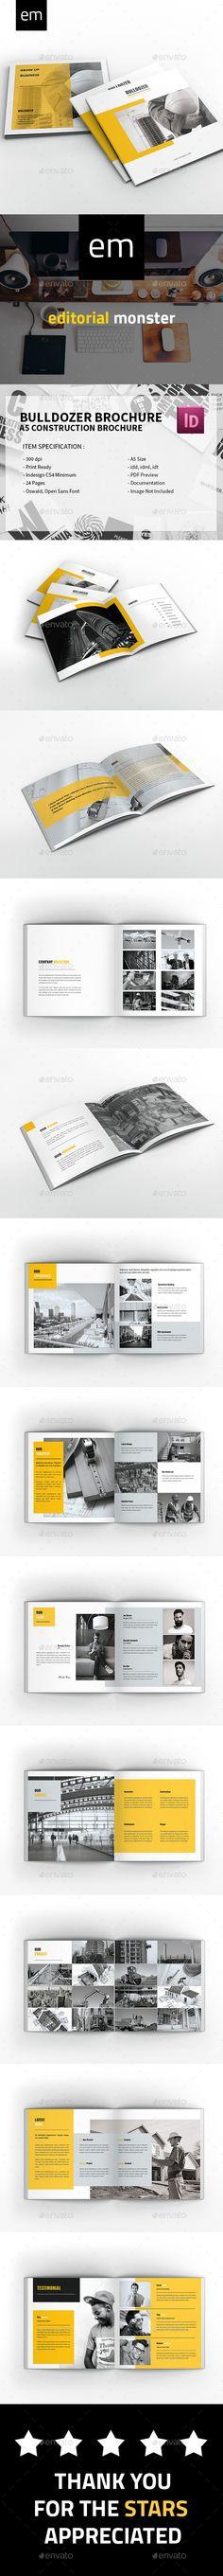 Brand Manual Brand manual, Brochure template and Brochures - it manual templates to download